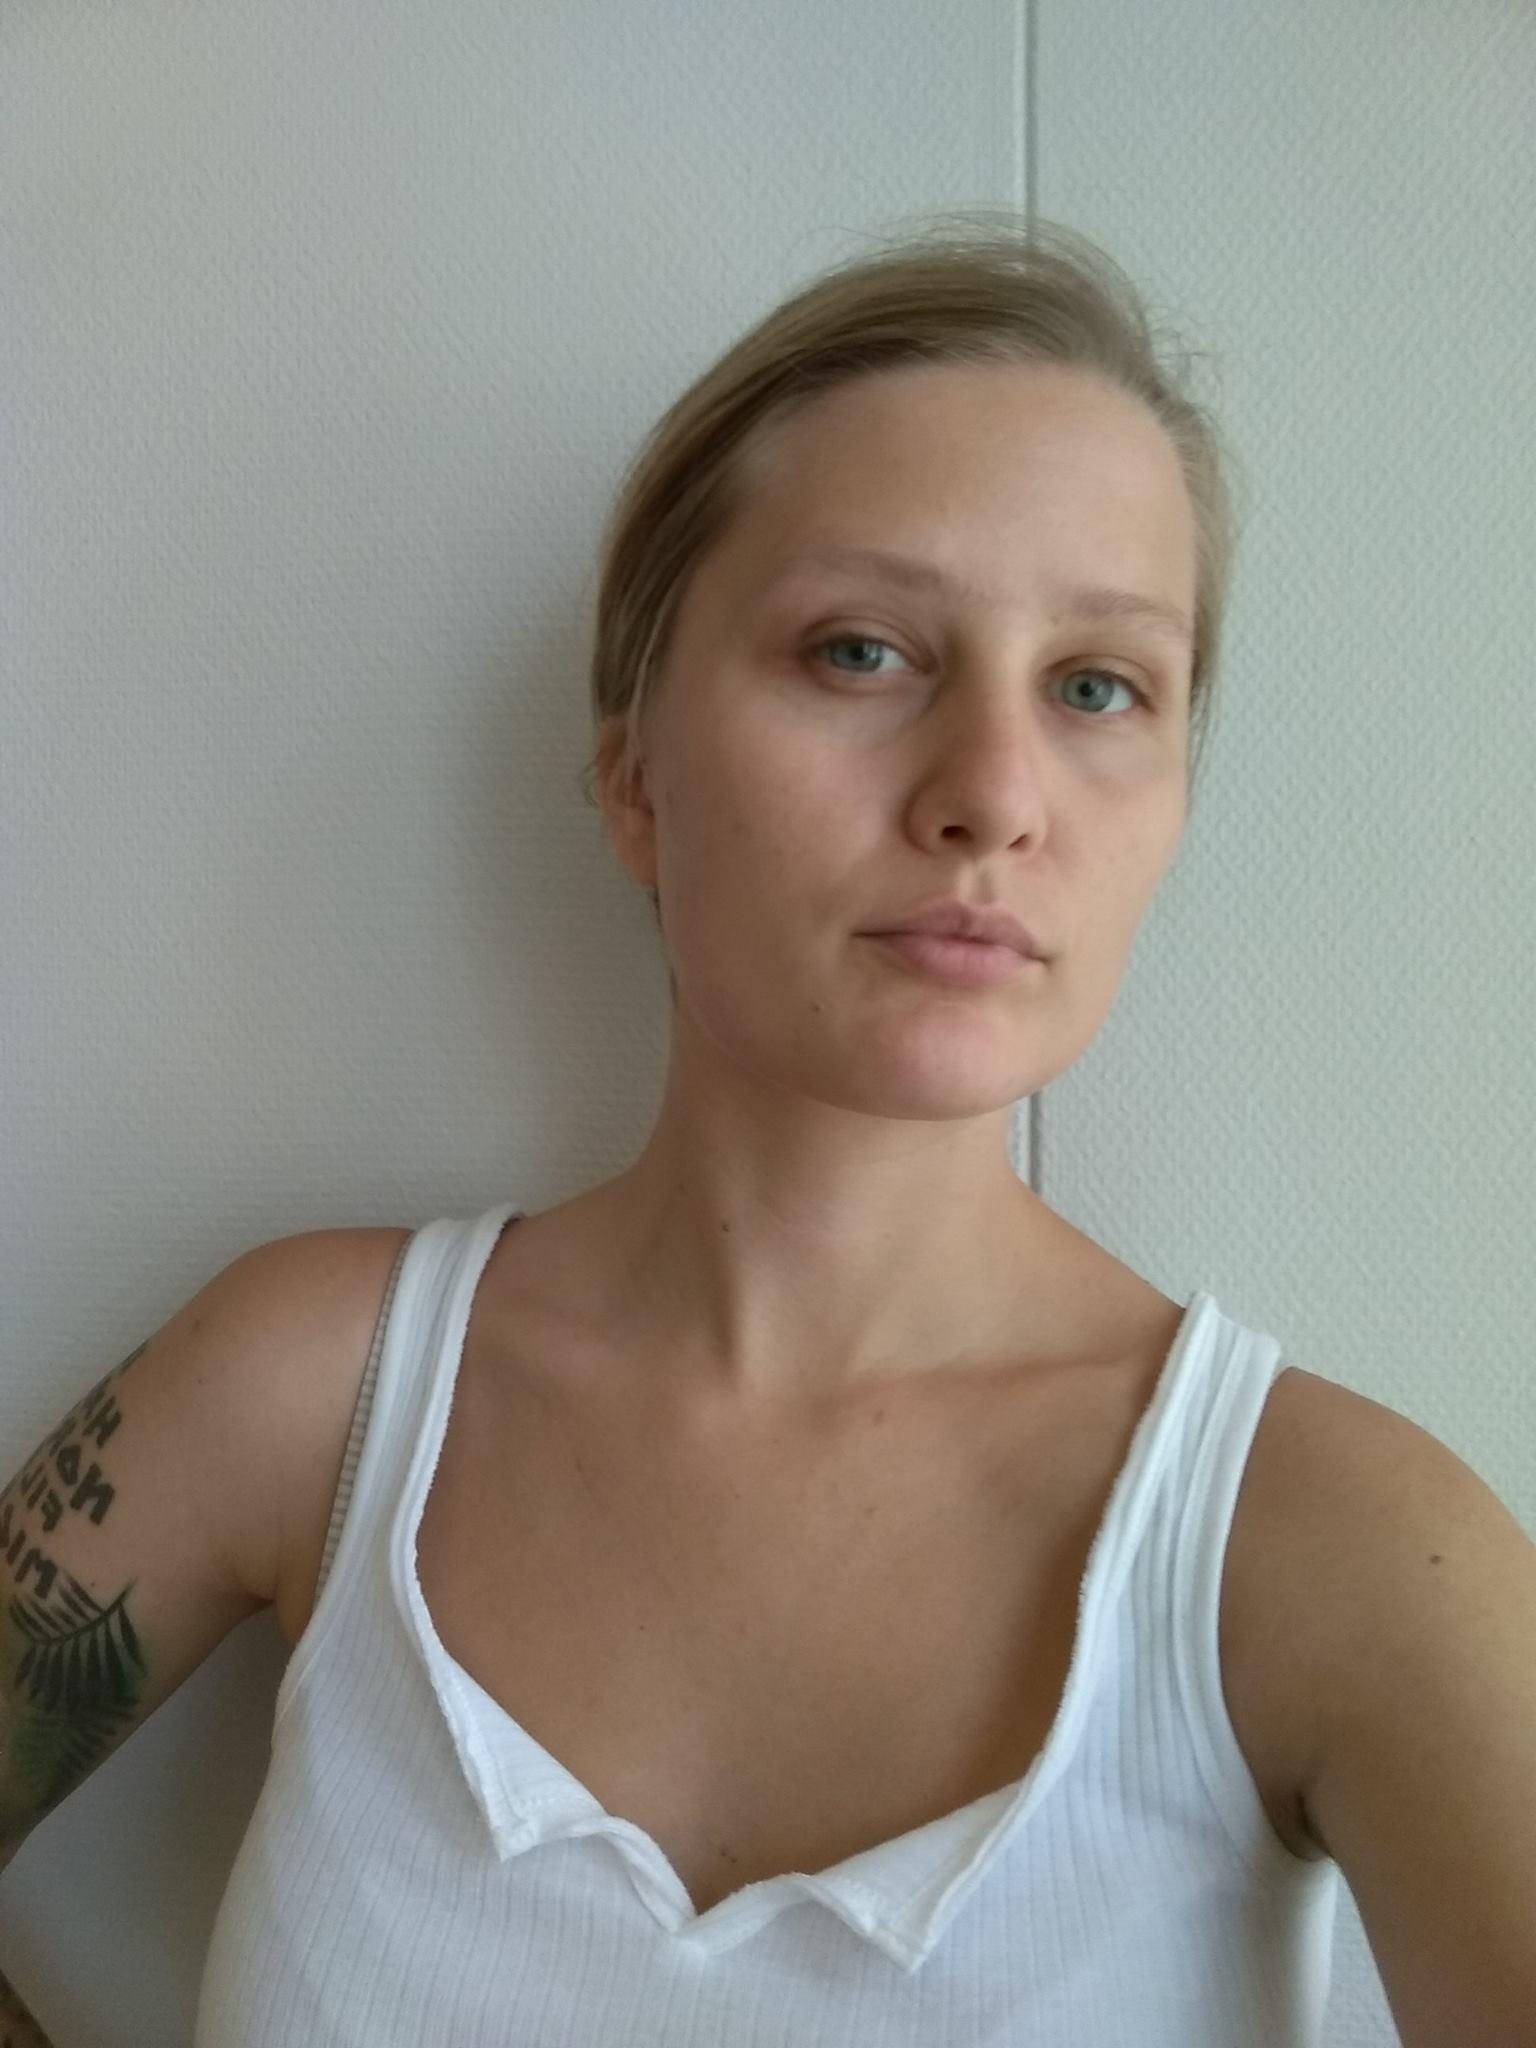 Isabelle Brehmer